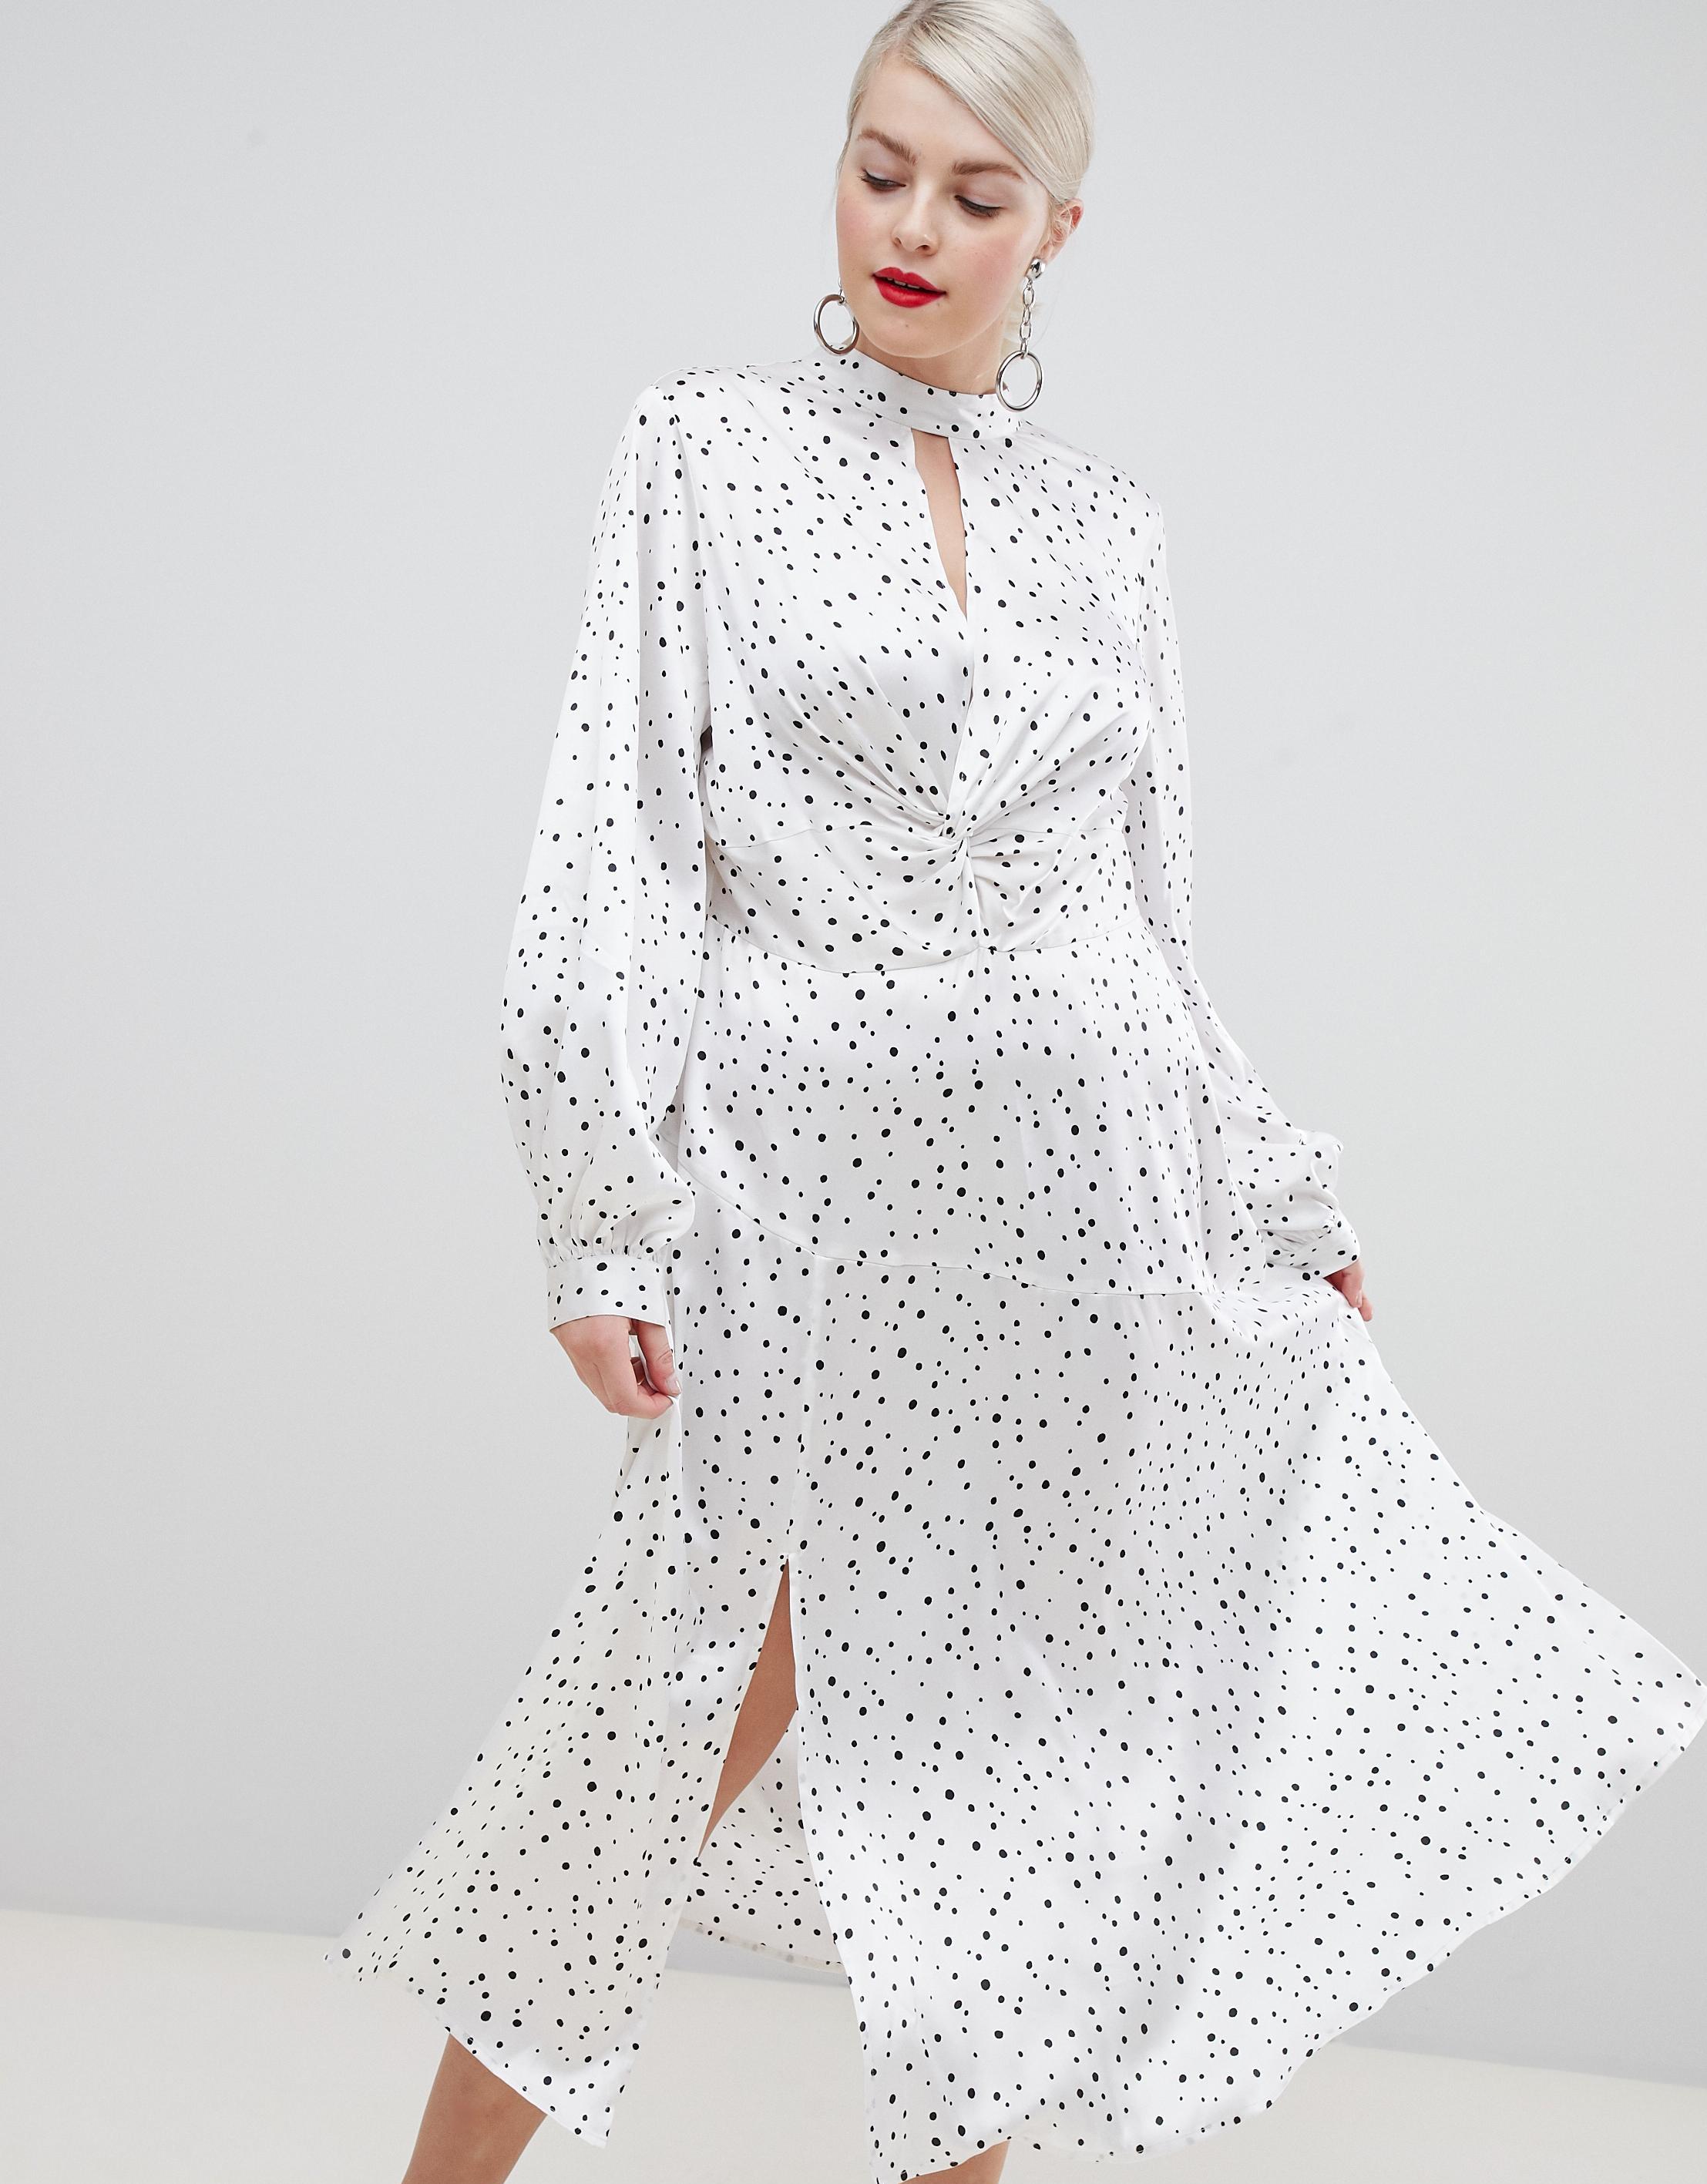 2474fde5ff290 Black Friday Sales 2018 Clothing   Womens Fashion Deals